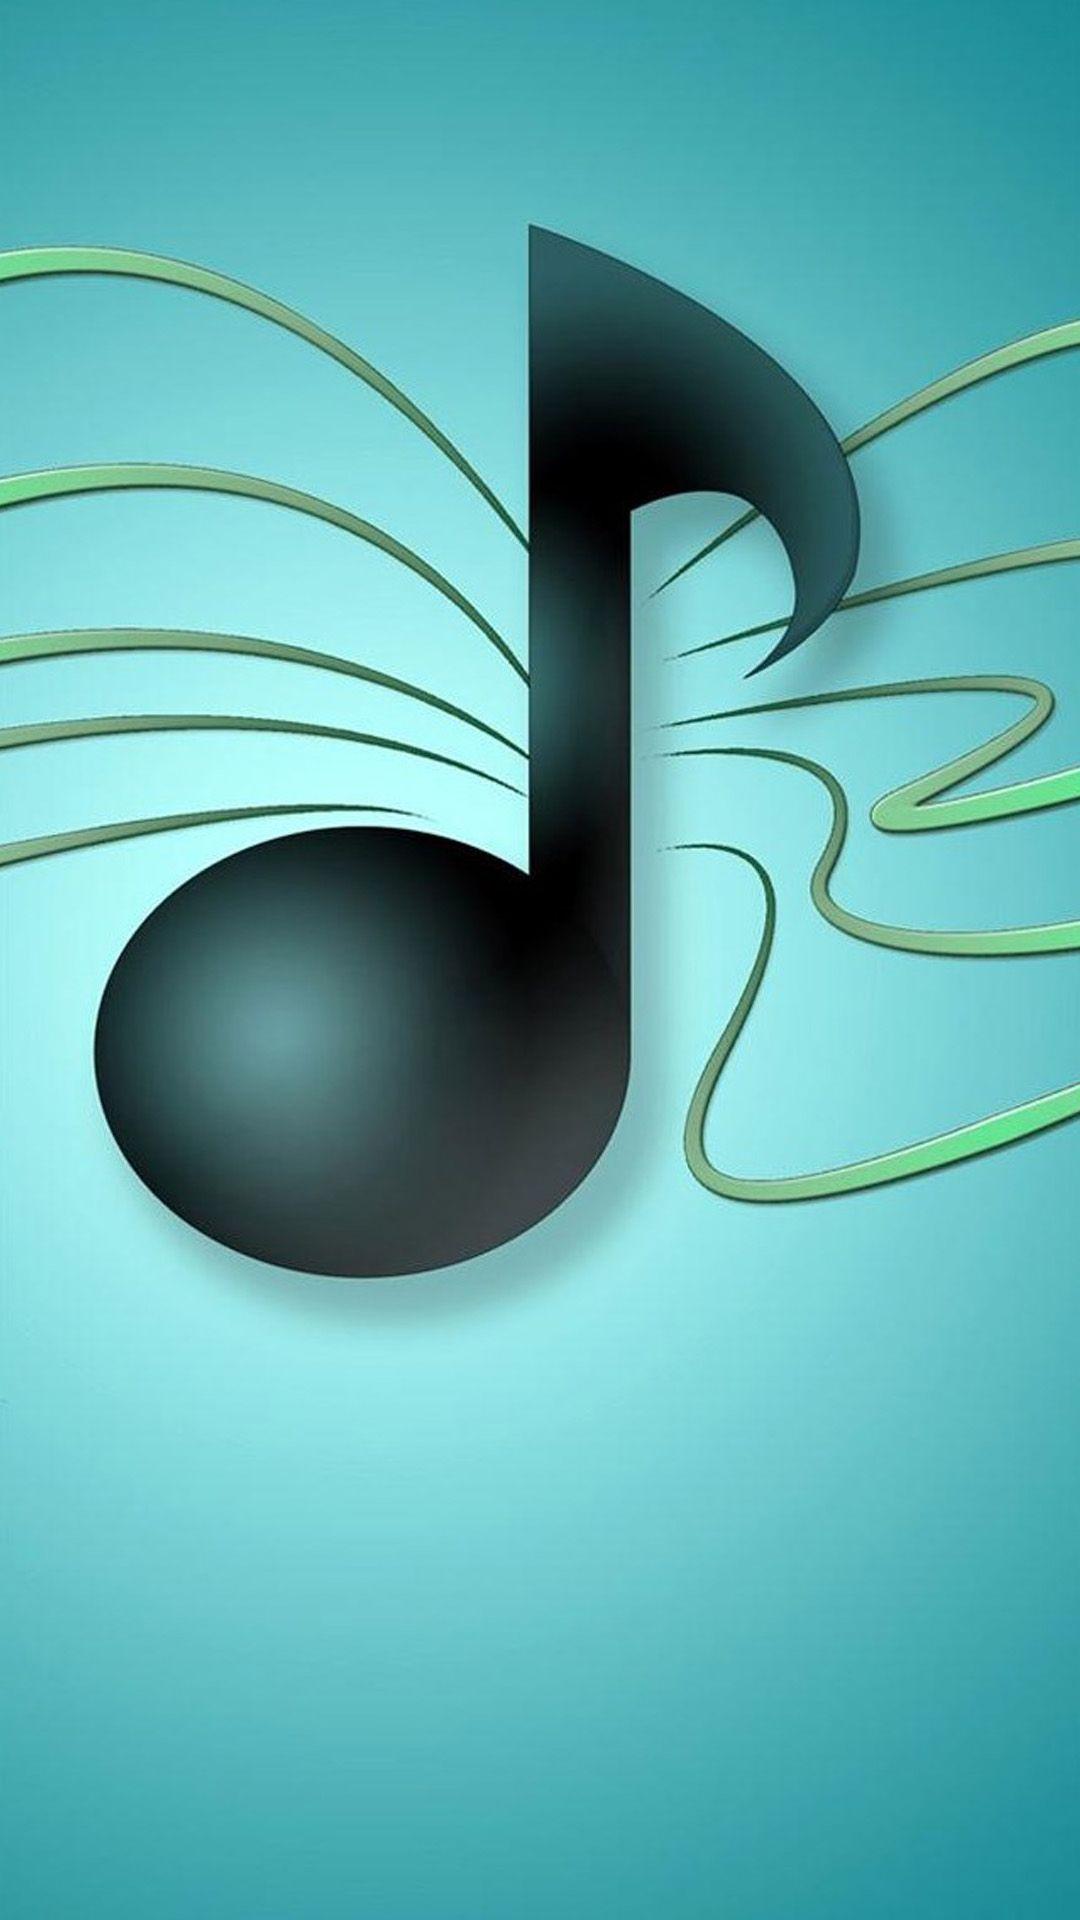 Good Wallpaper Music Note 3 - b1677446477b57a4fc61cce158b3667b  HD_282741.jpg